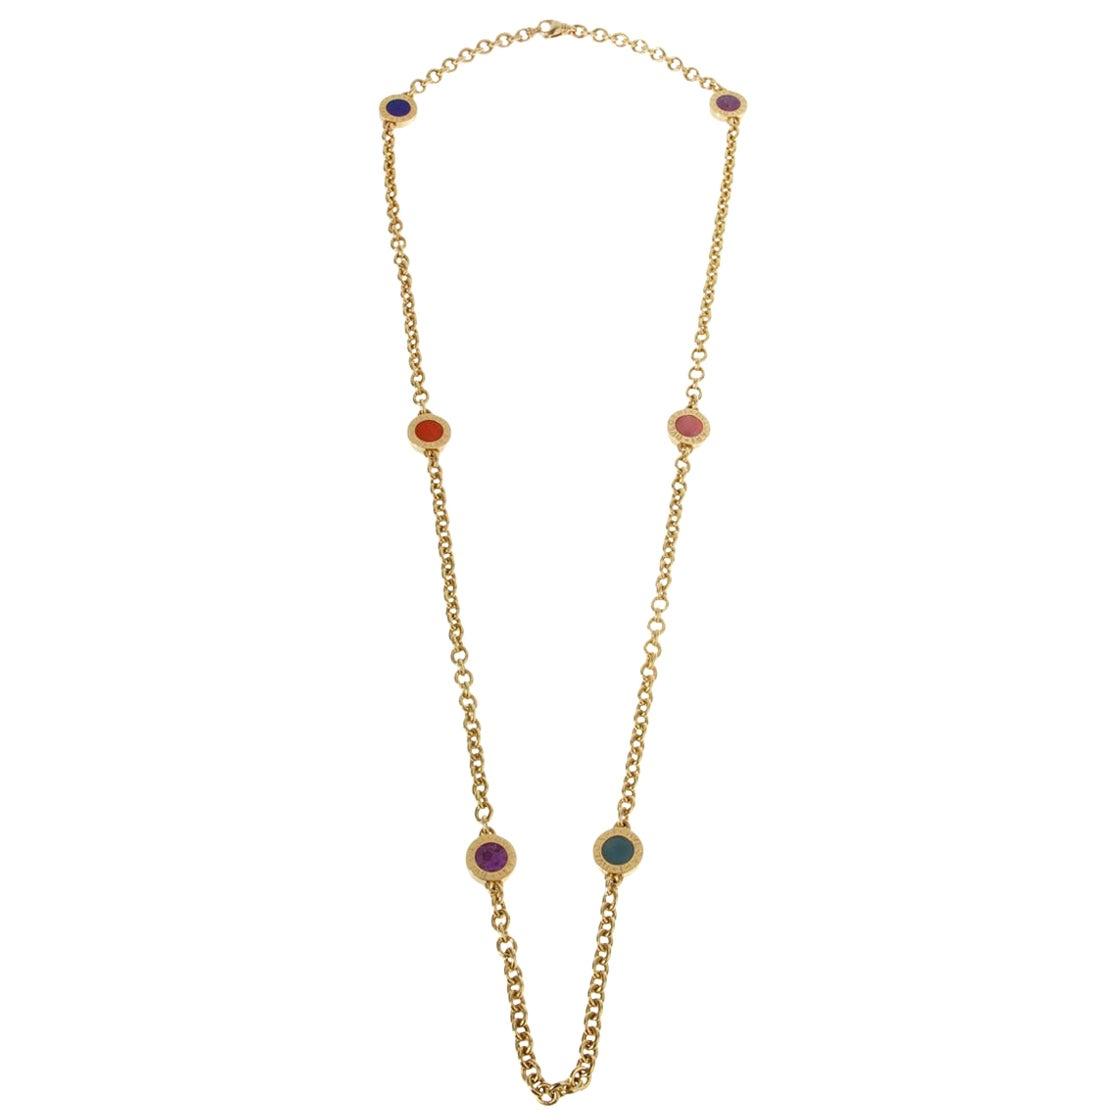 Bulgari Bulgari Vintage Yellow Gold Sautoir Necklace